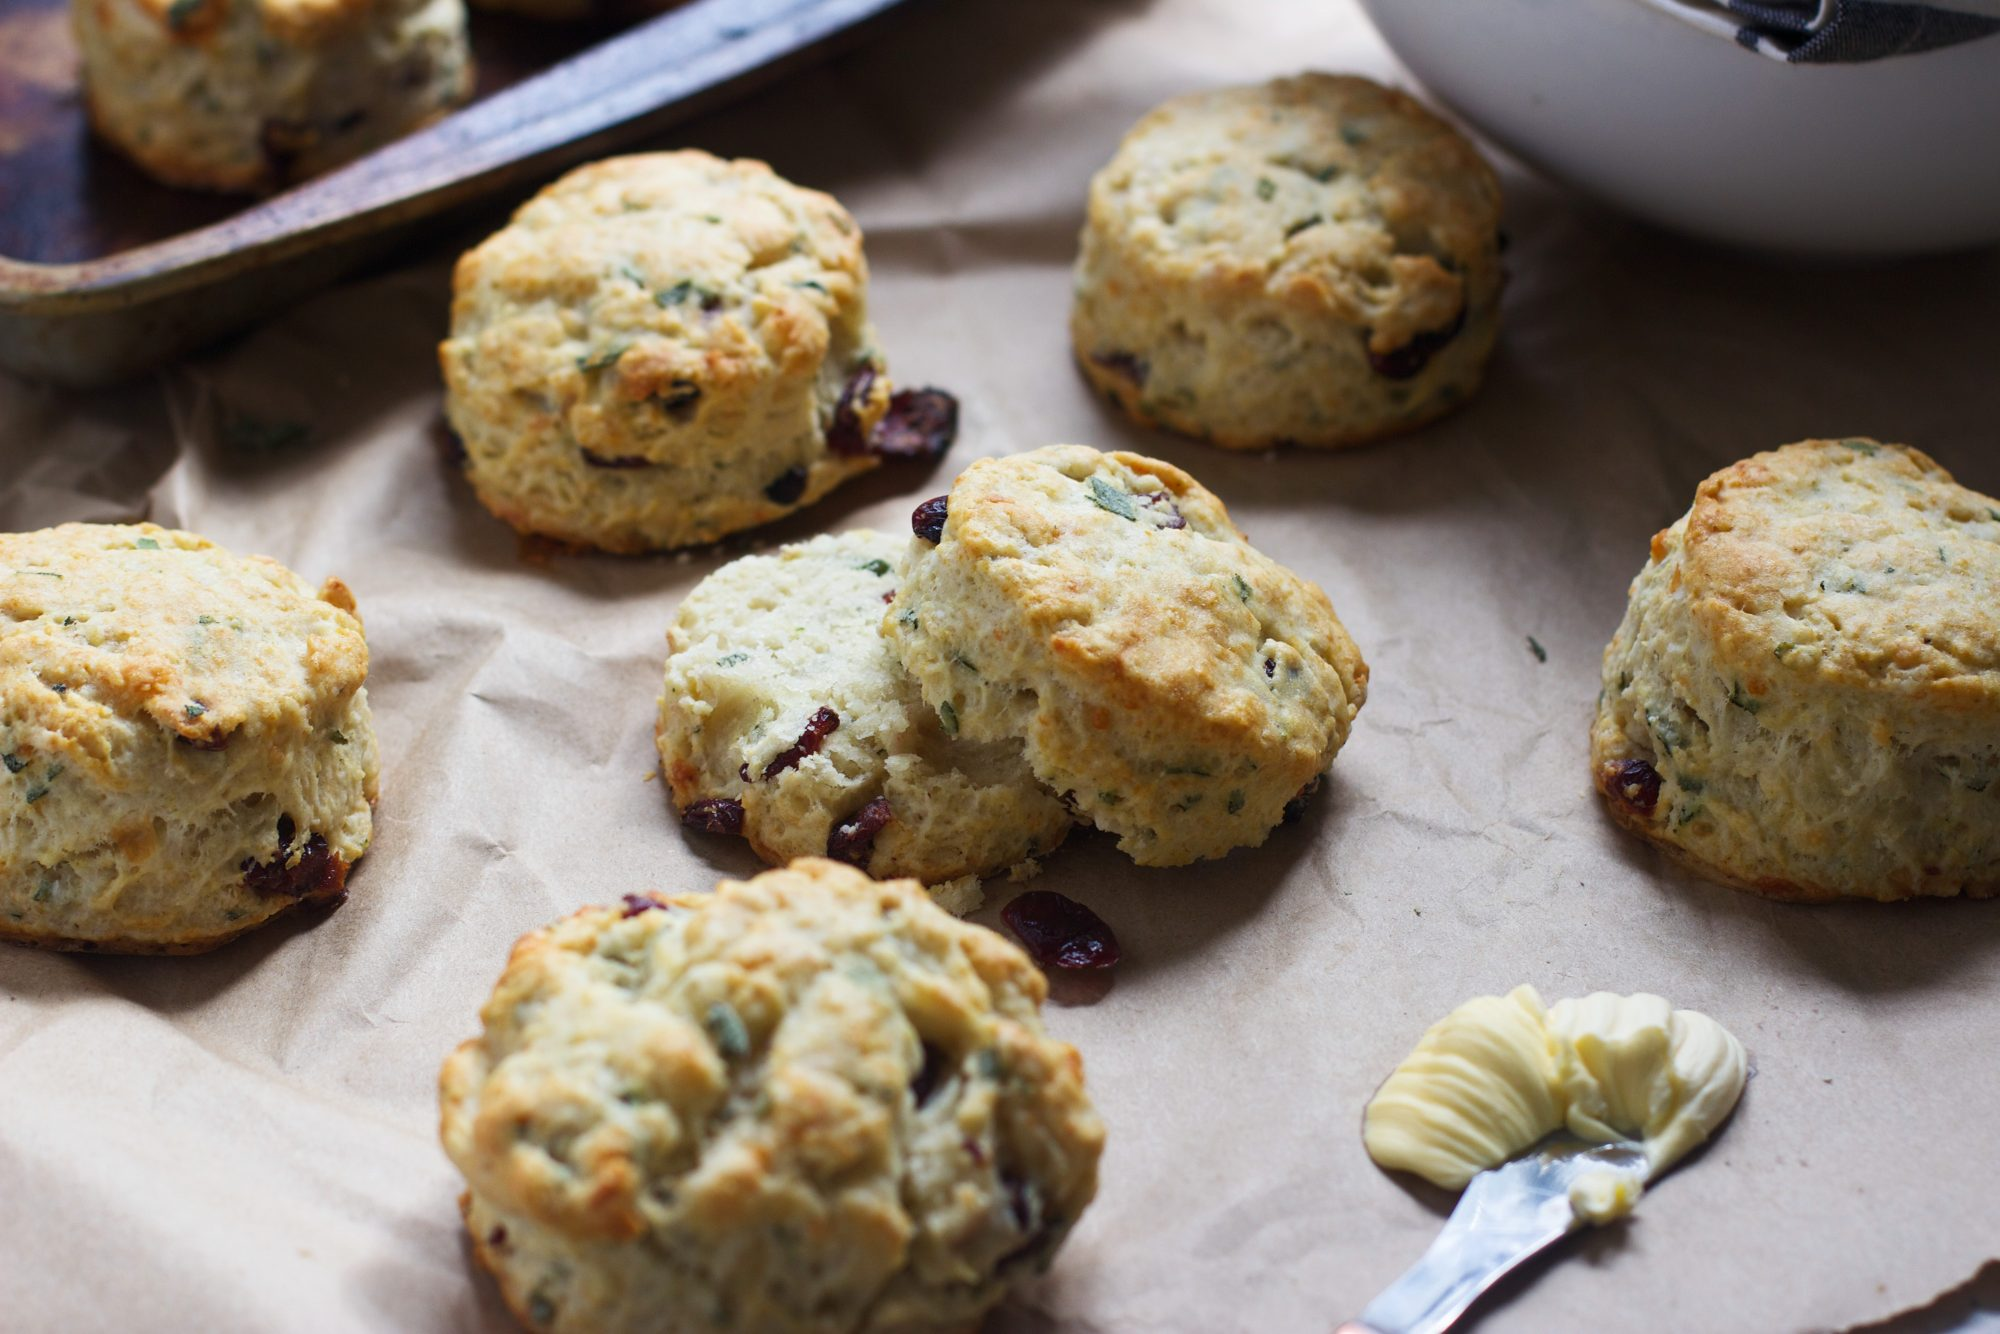 Gruyere-Cranberry-and-Sage-Buttermilk-Biscuits-3.jpg